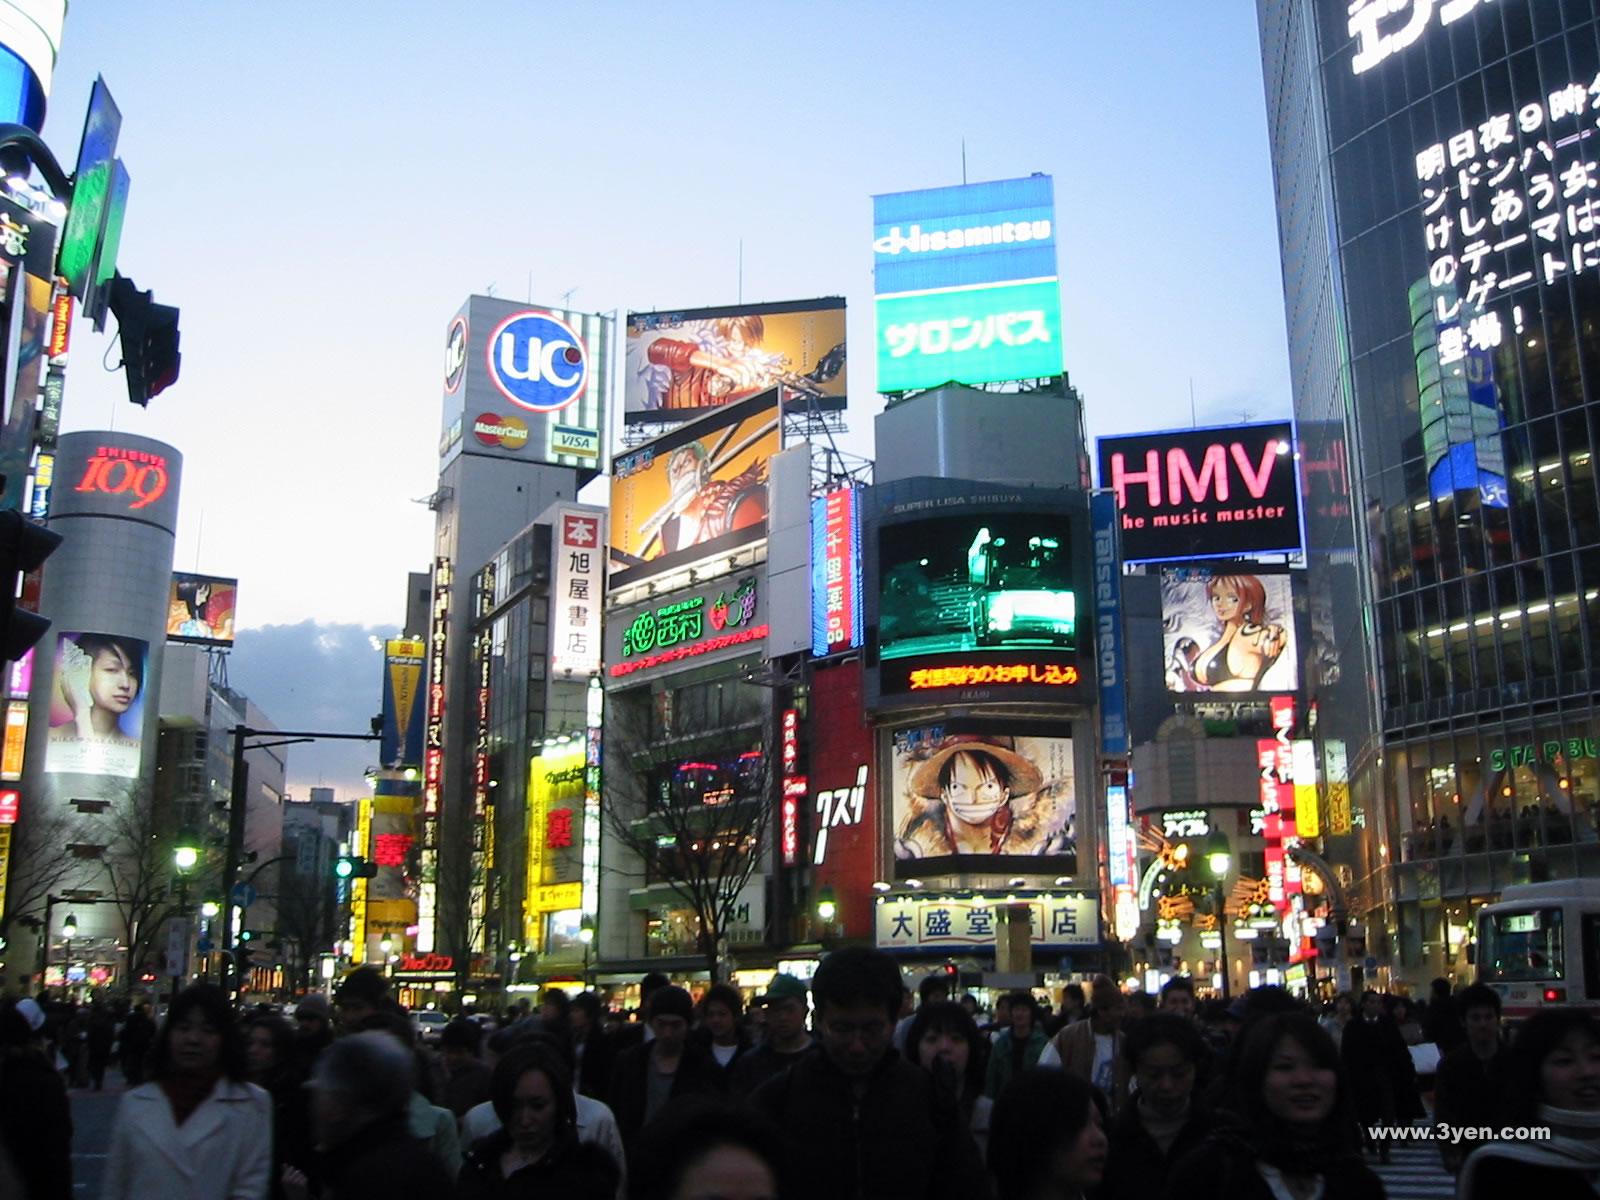 Japan News – 1st Edition